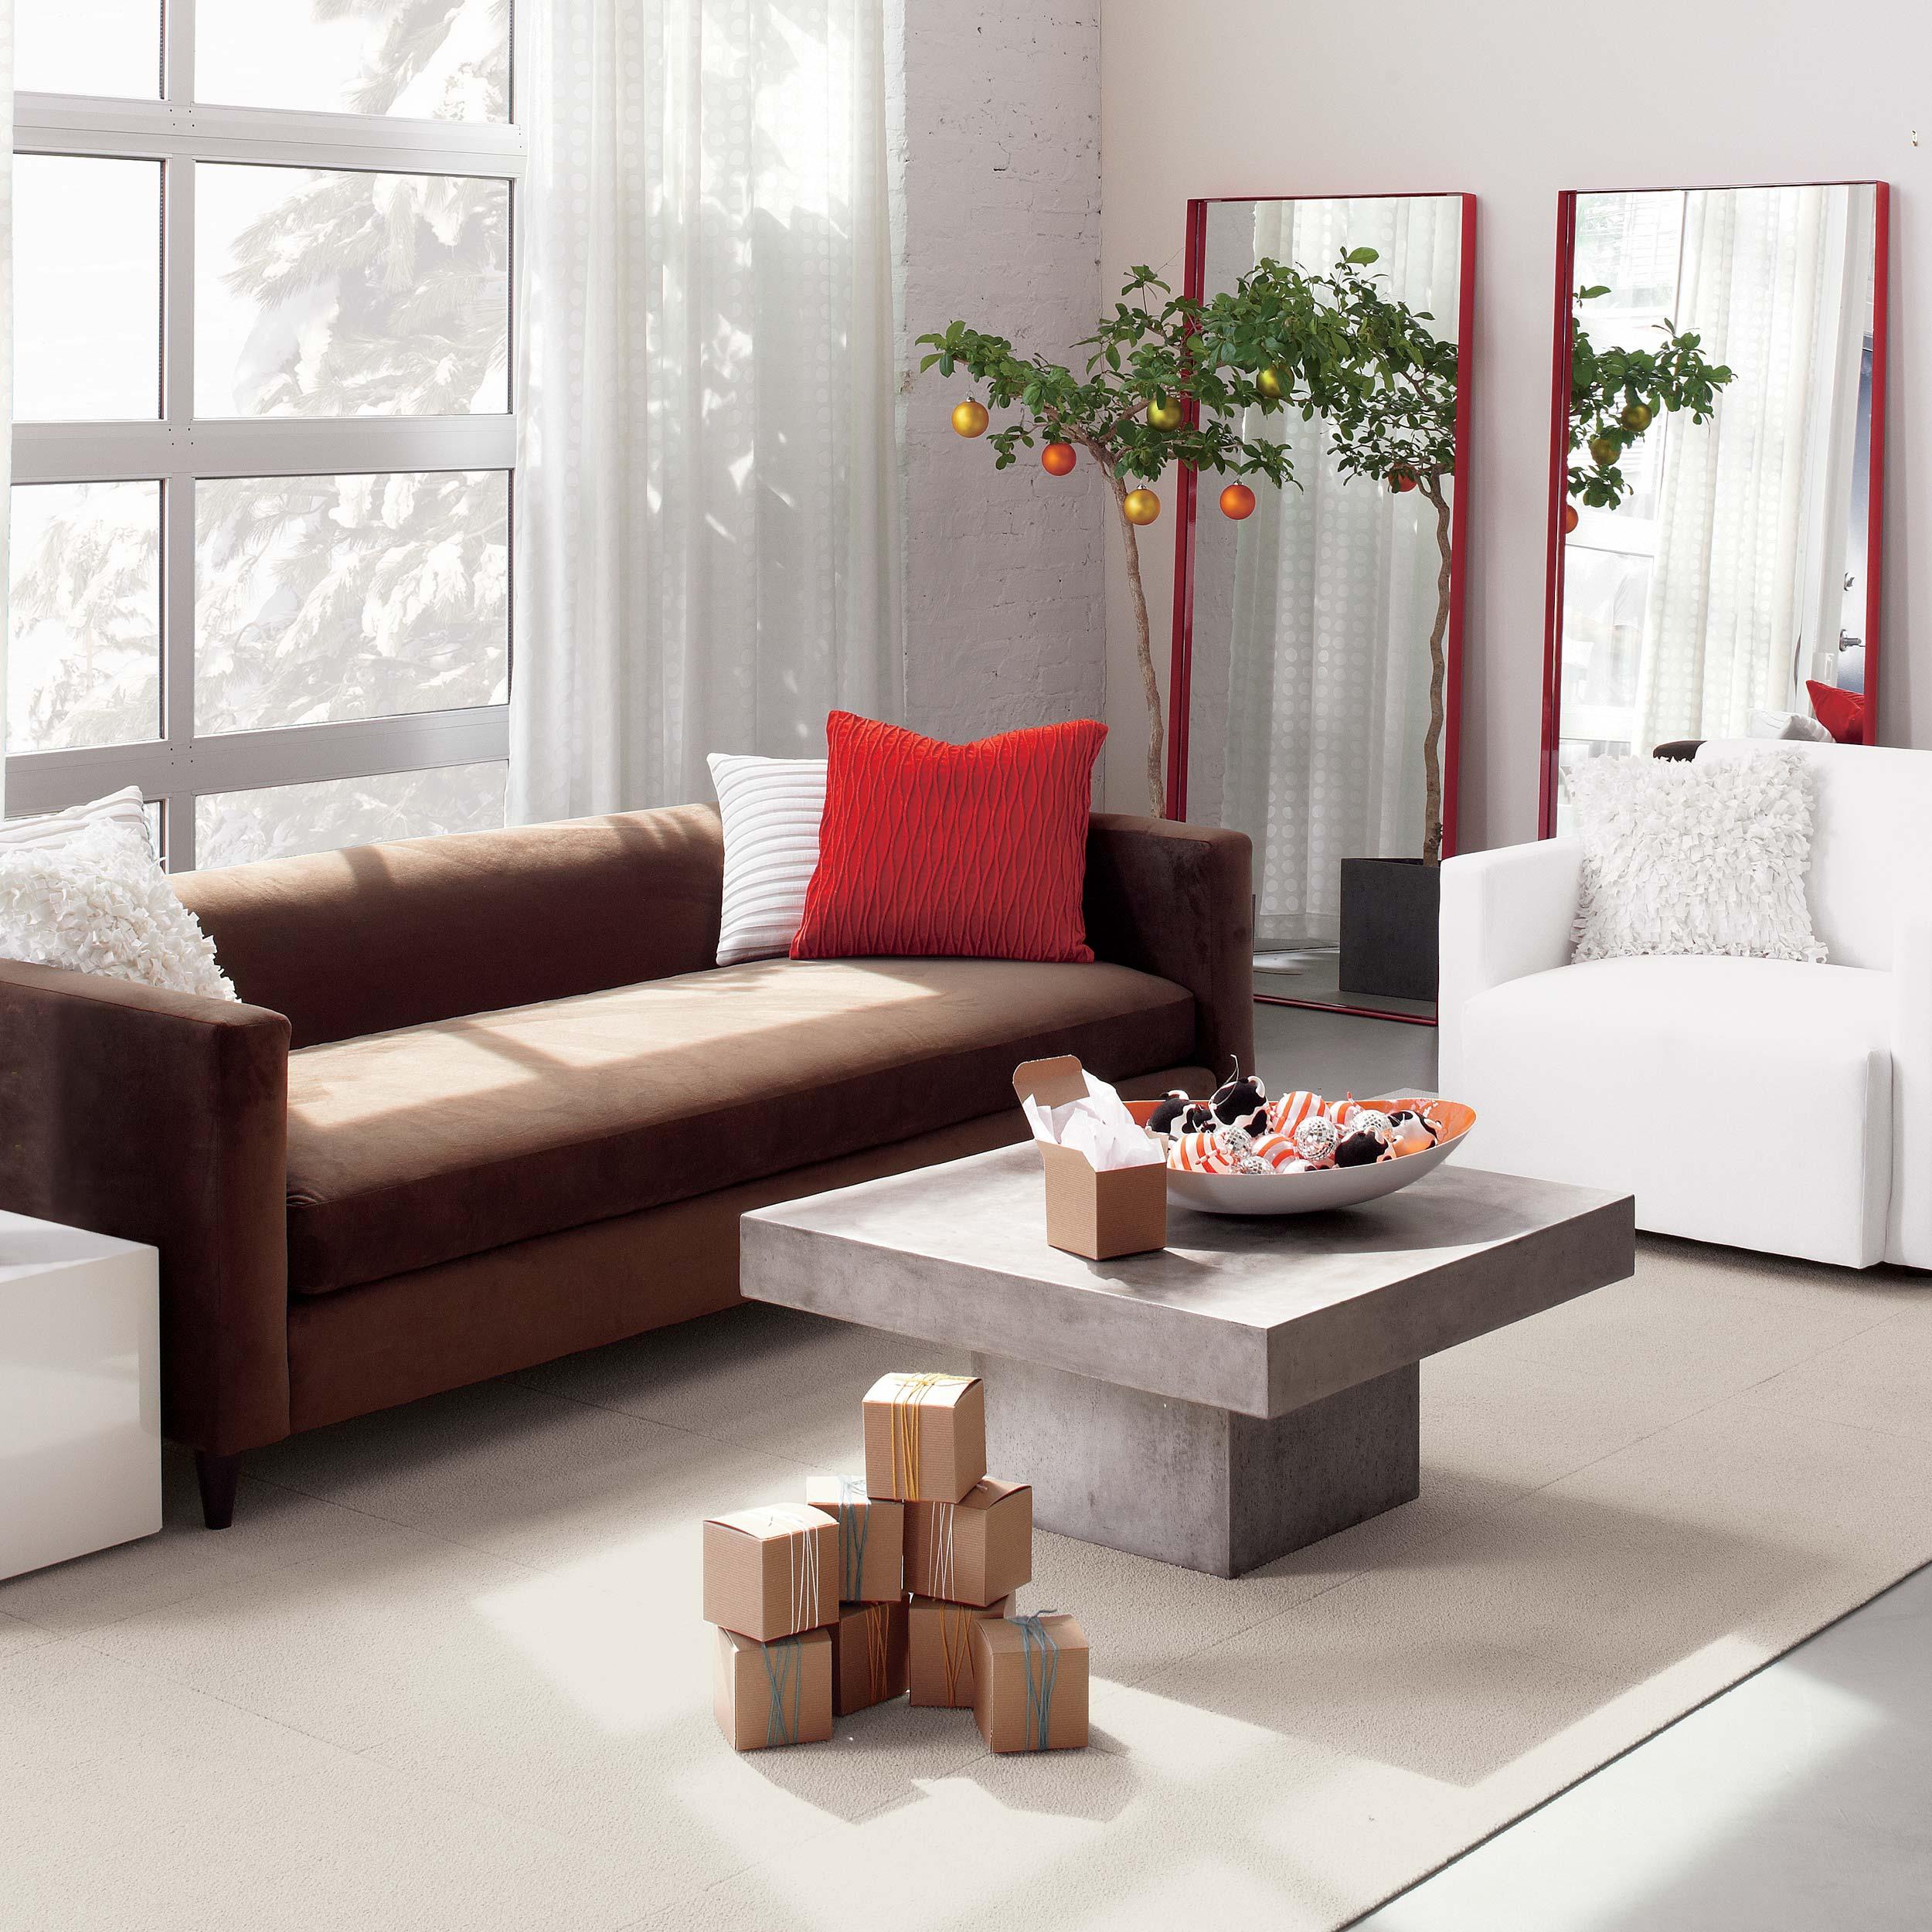 CB2_living room_holiday_molly fitzsimons.jpg